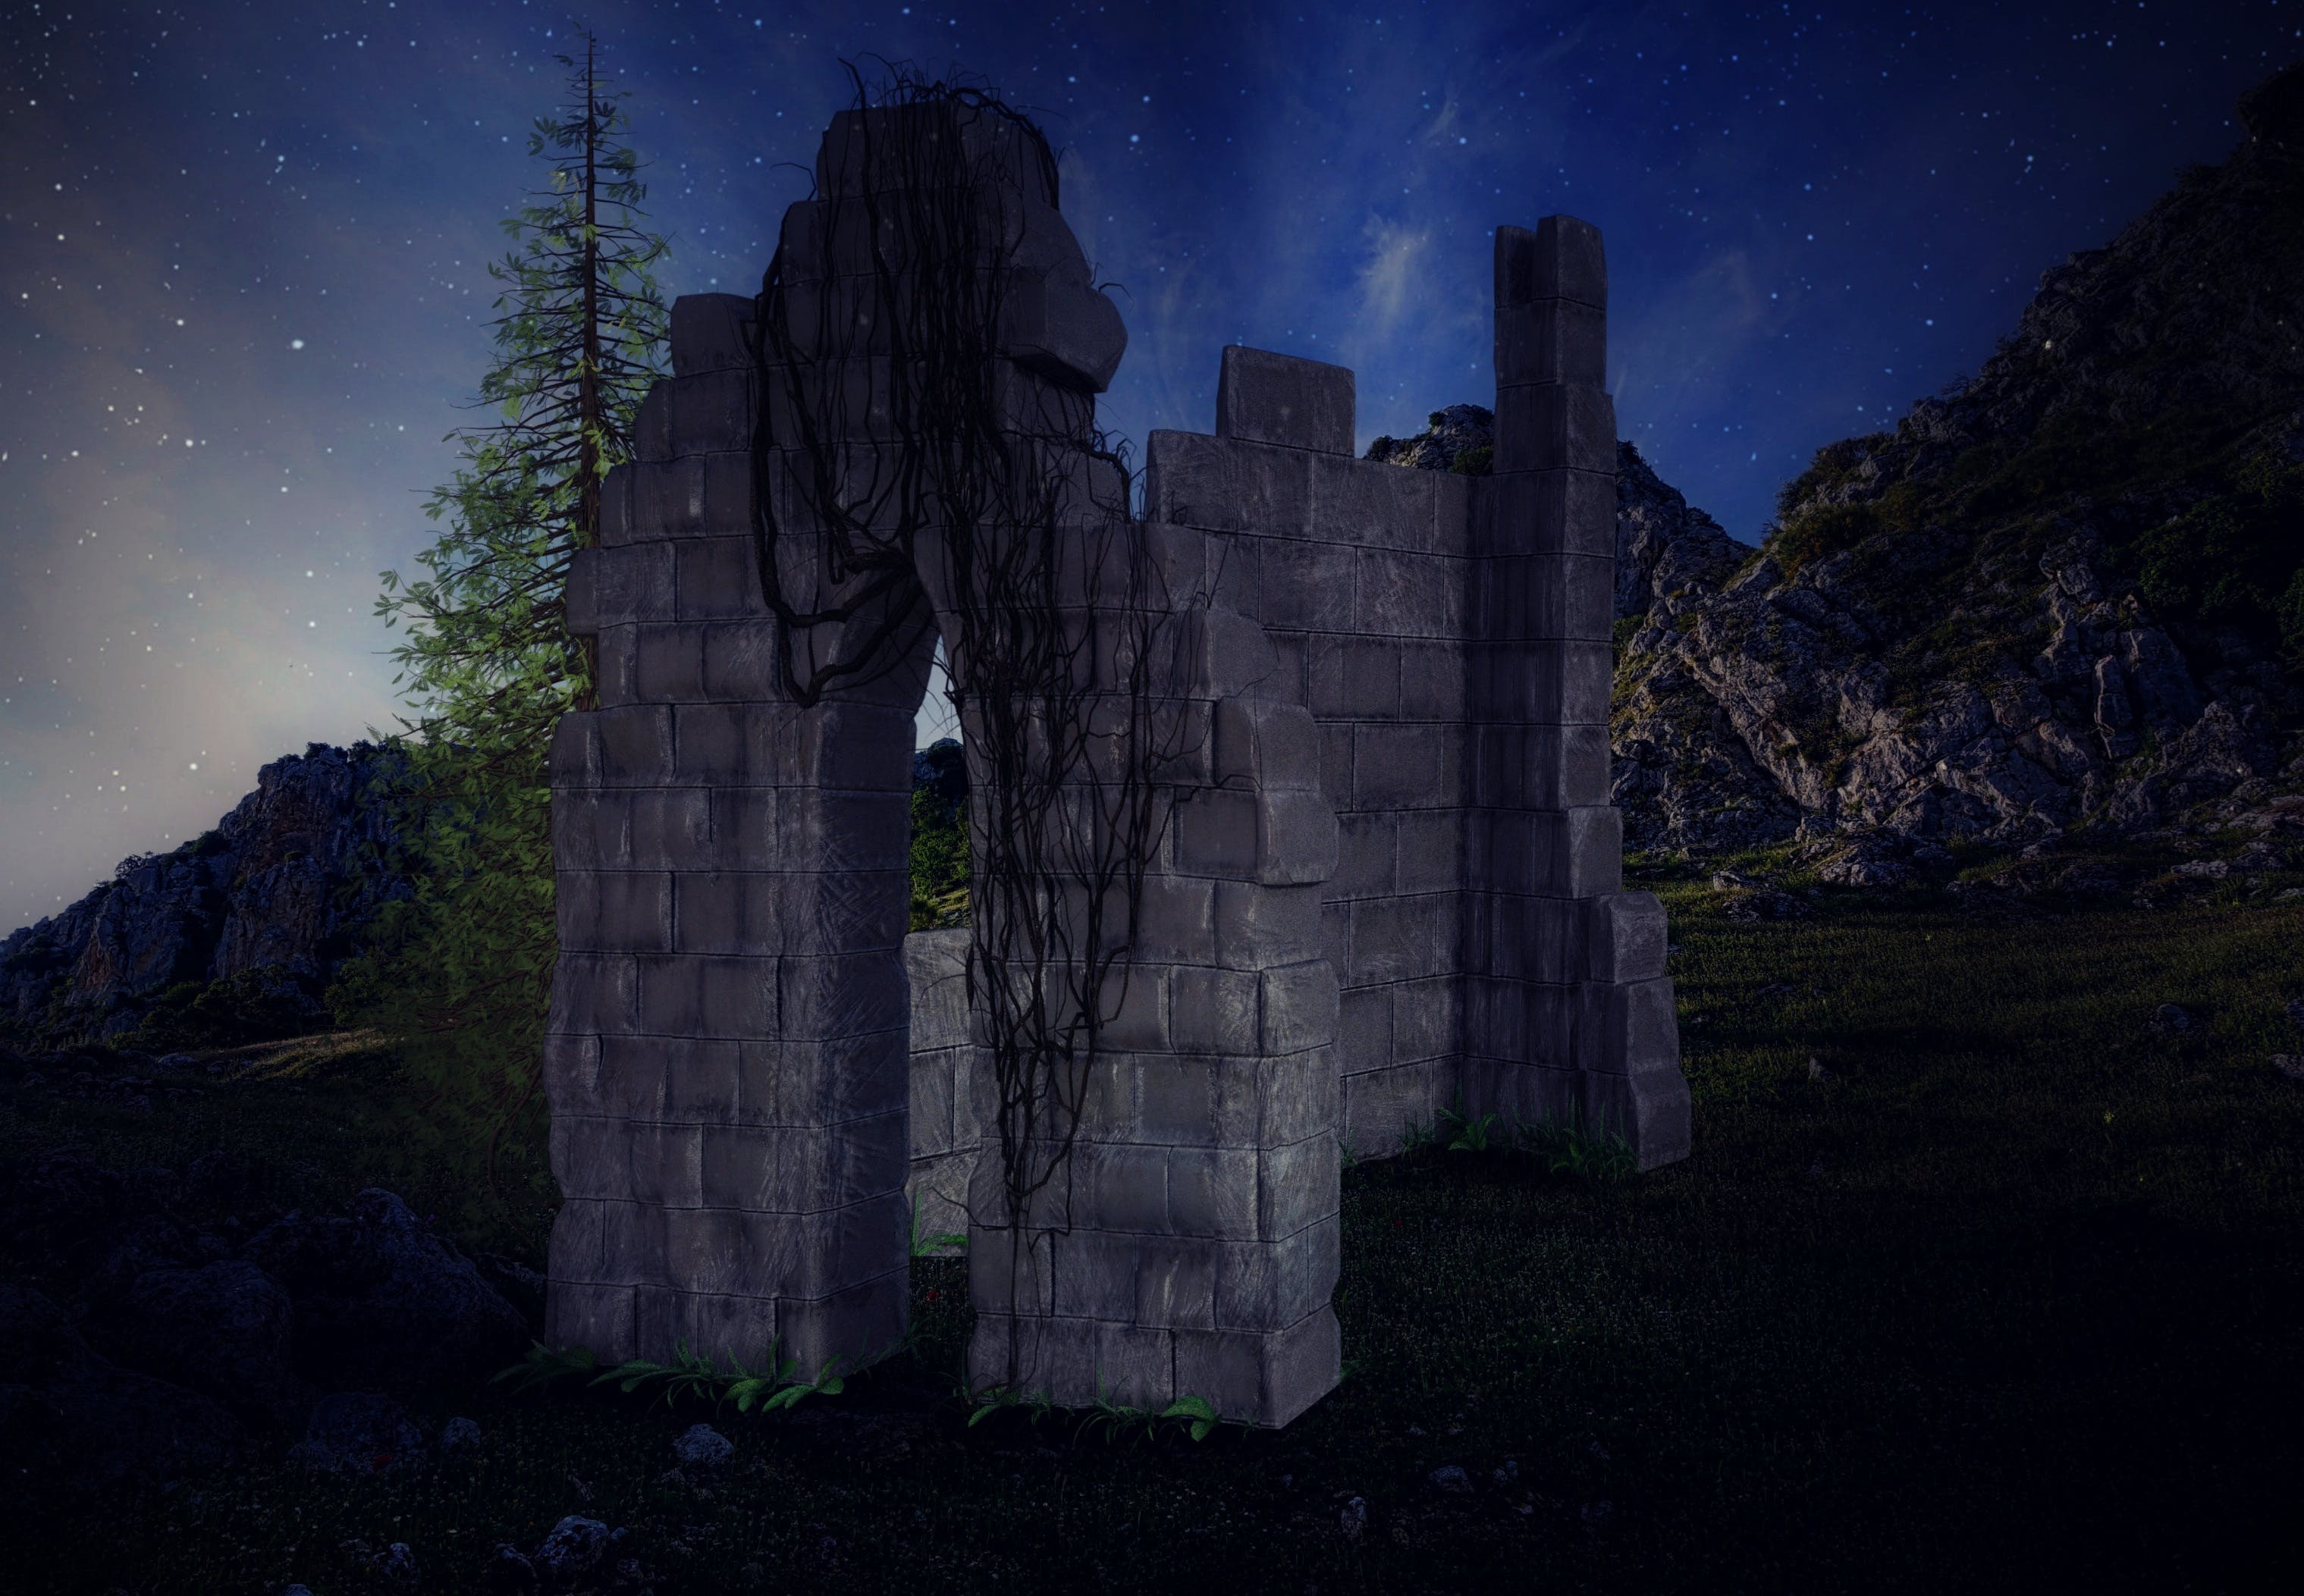 Free stock photo of landscape, mountains, nature, dark